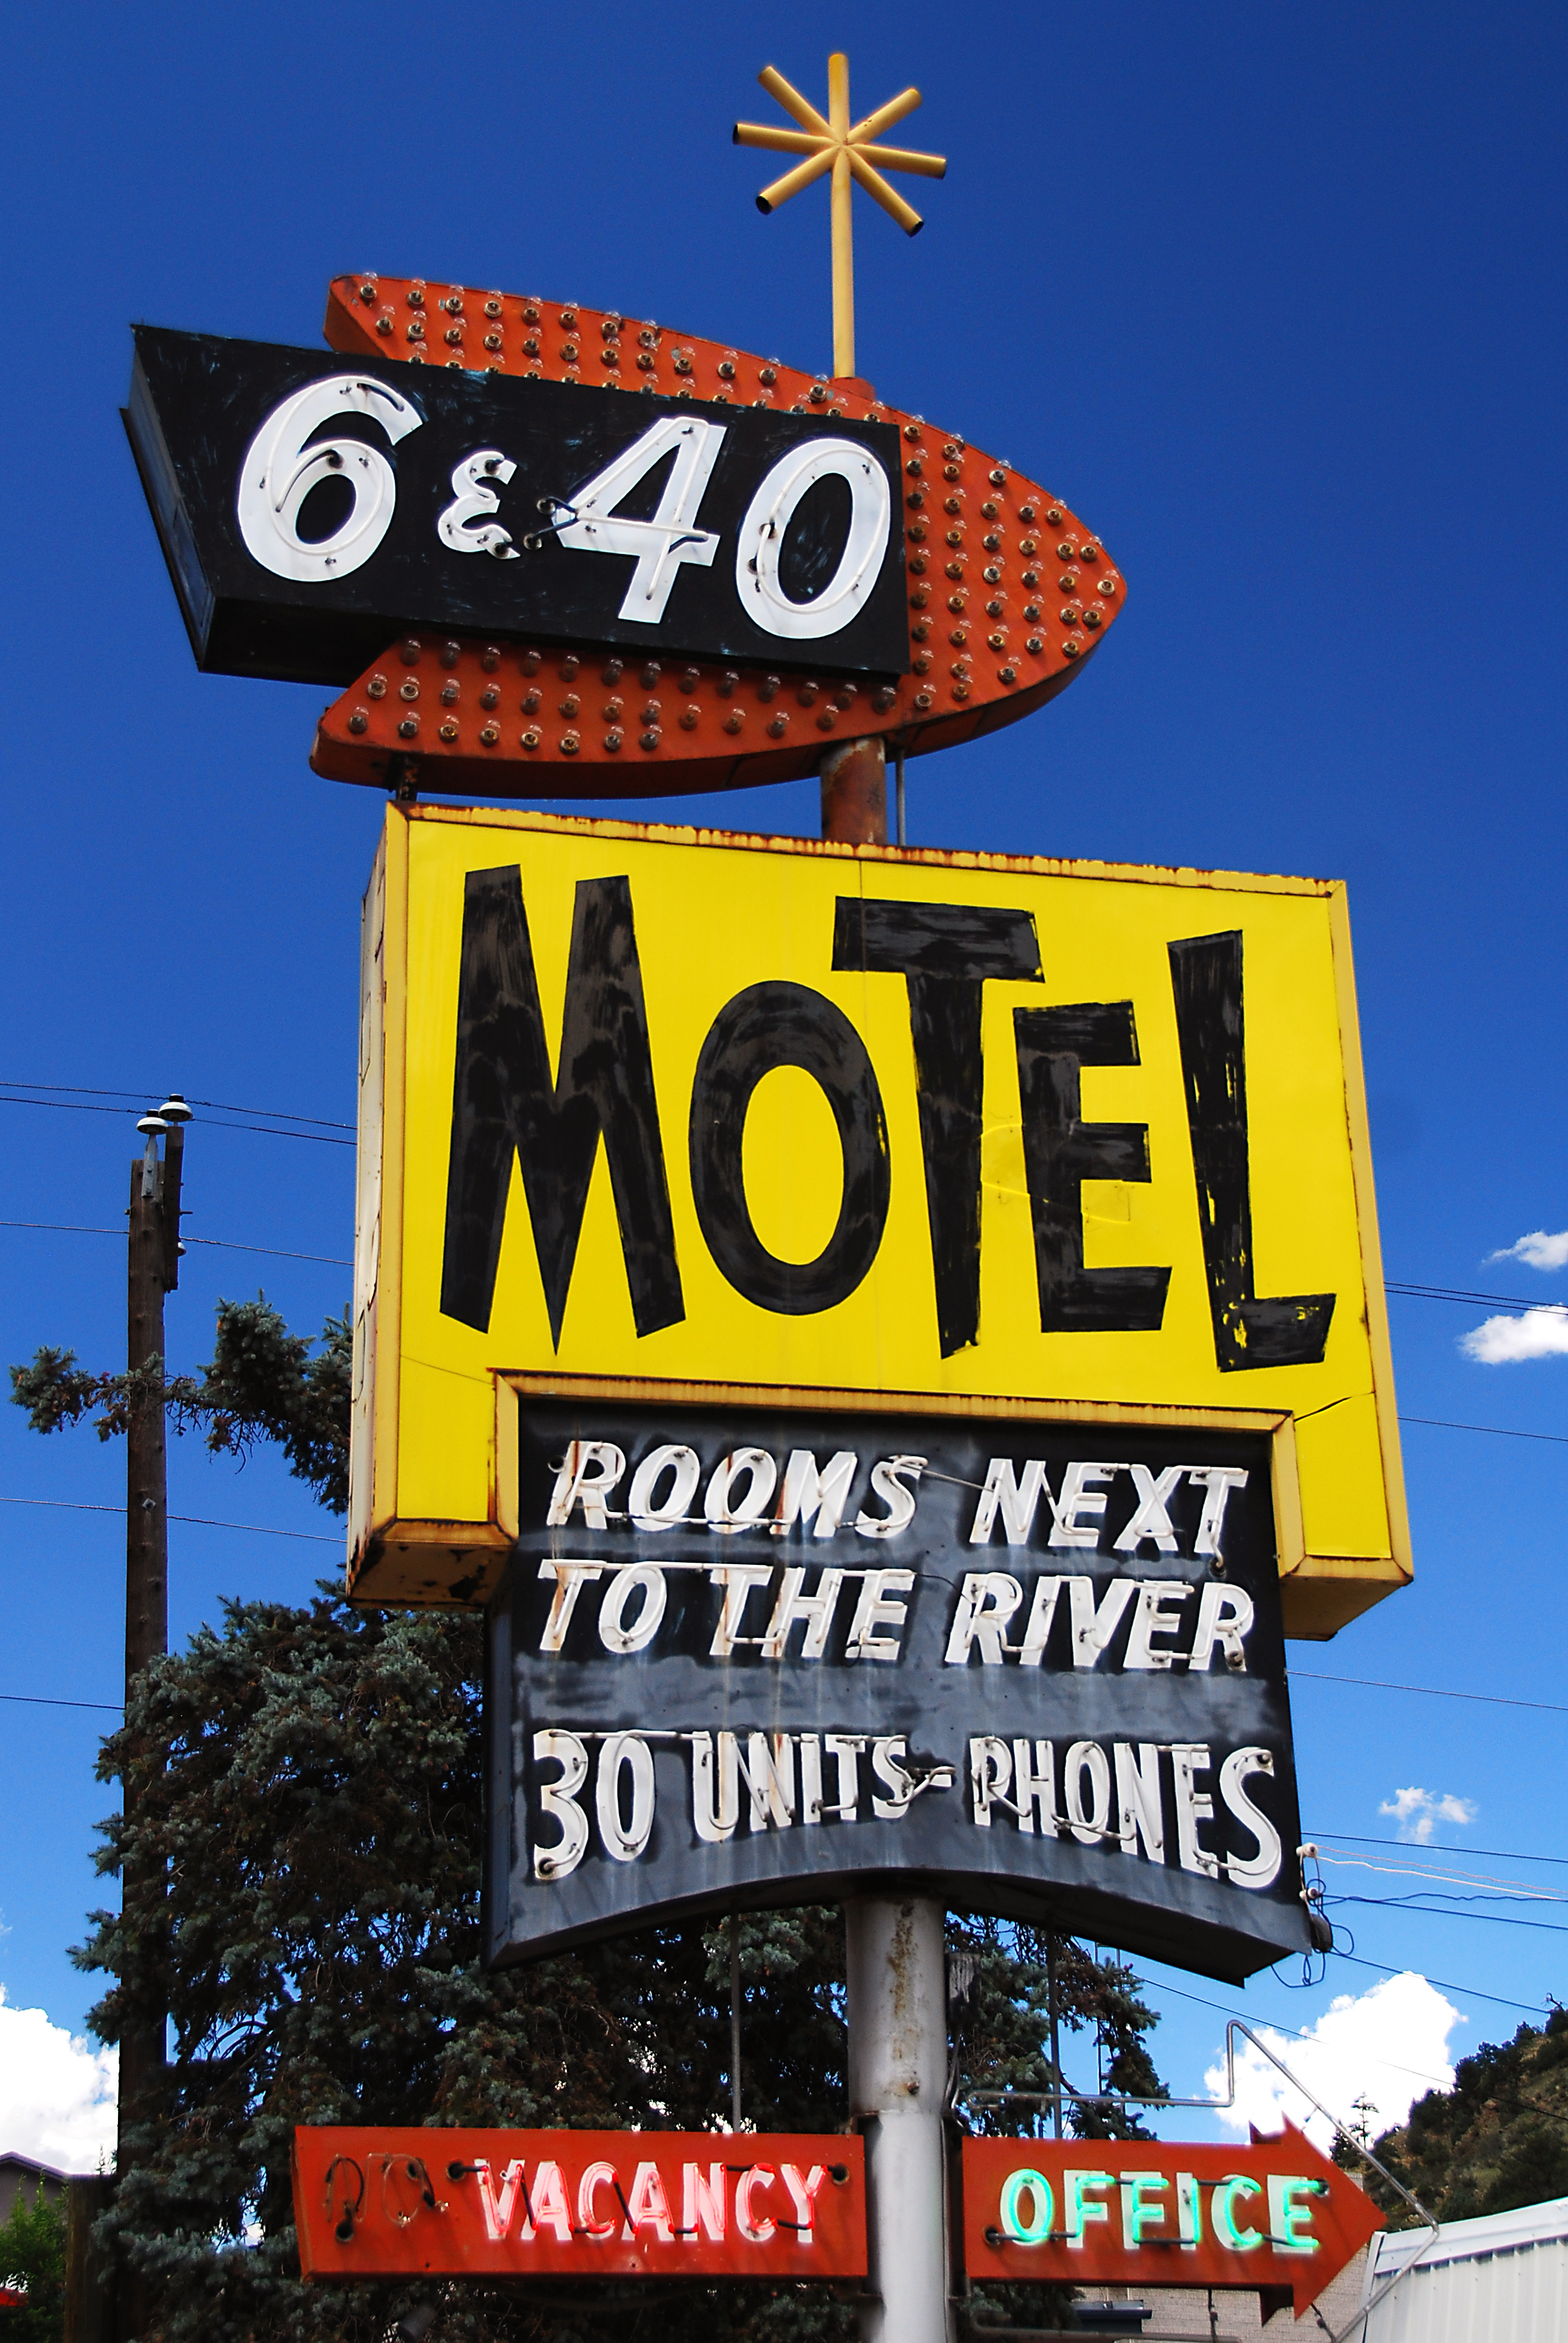 6 and 40 Motel - 2920 Colorado Boulevard, Idaho Springs, Colorado U.S.A. - August 13, 2007